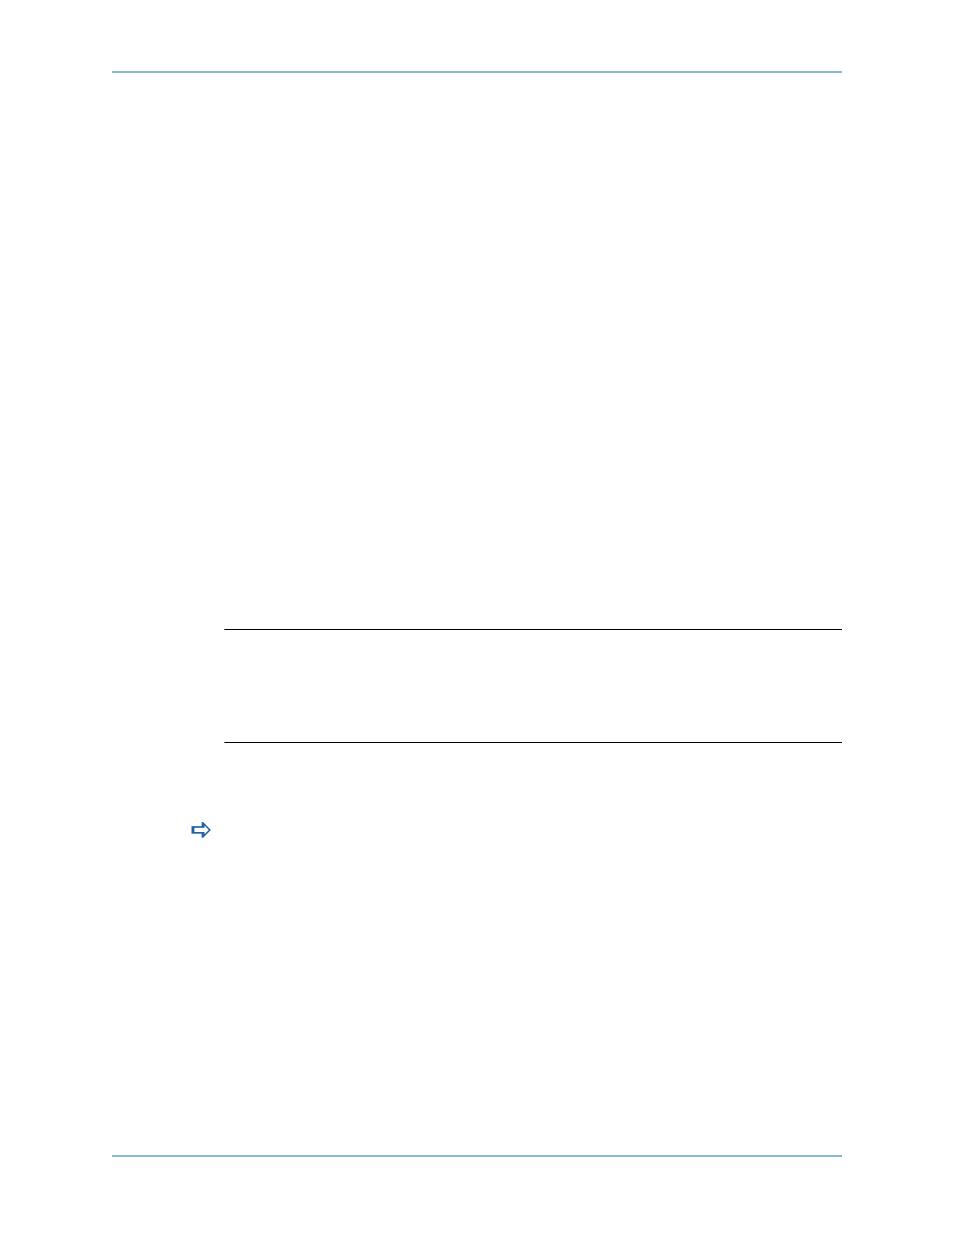 Servidor snmp, Configuración del servidor snmp